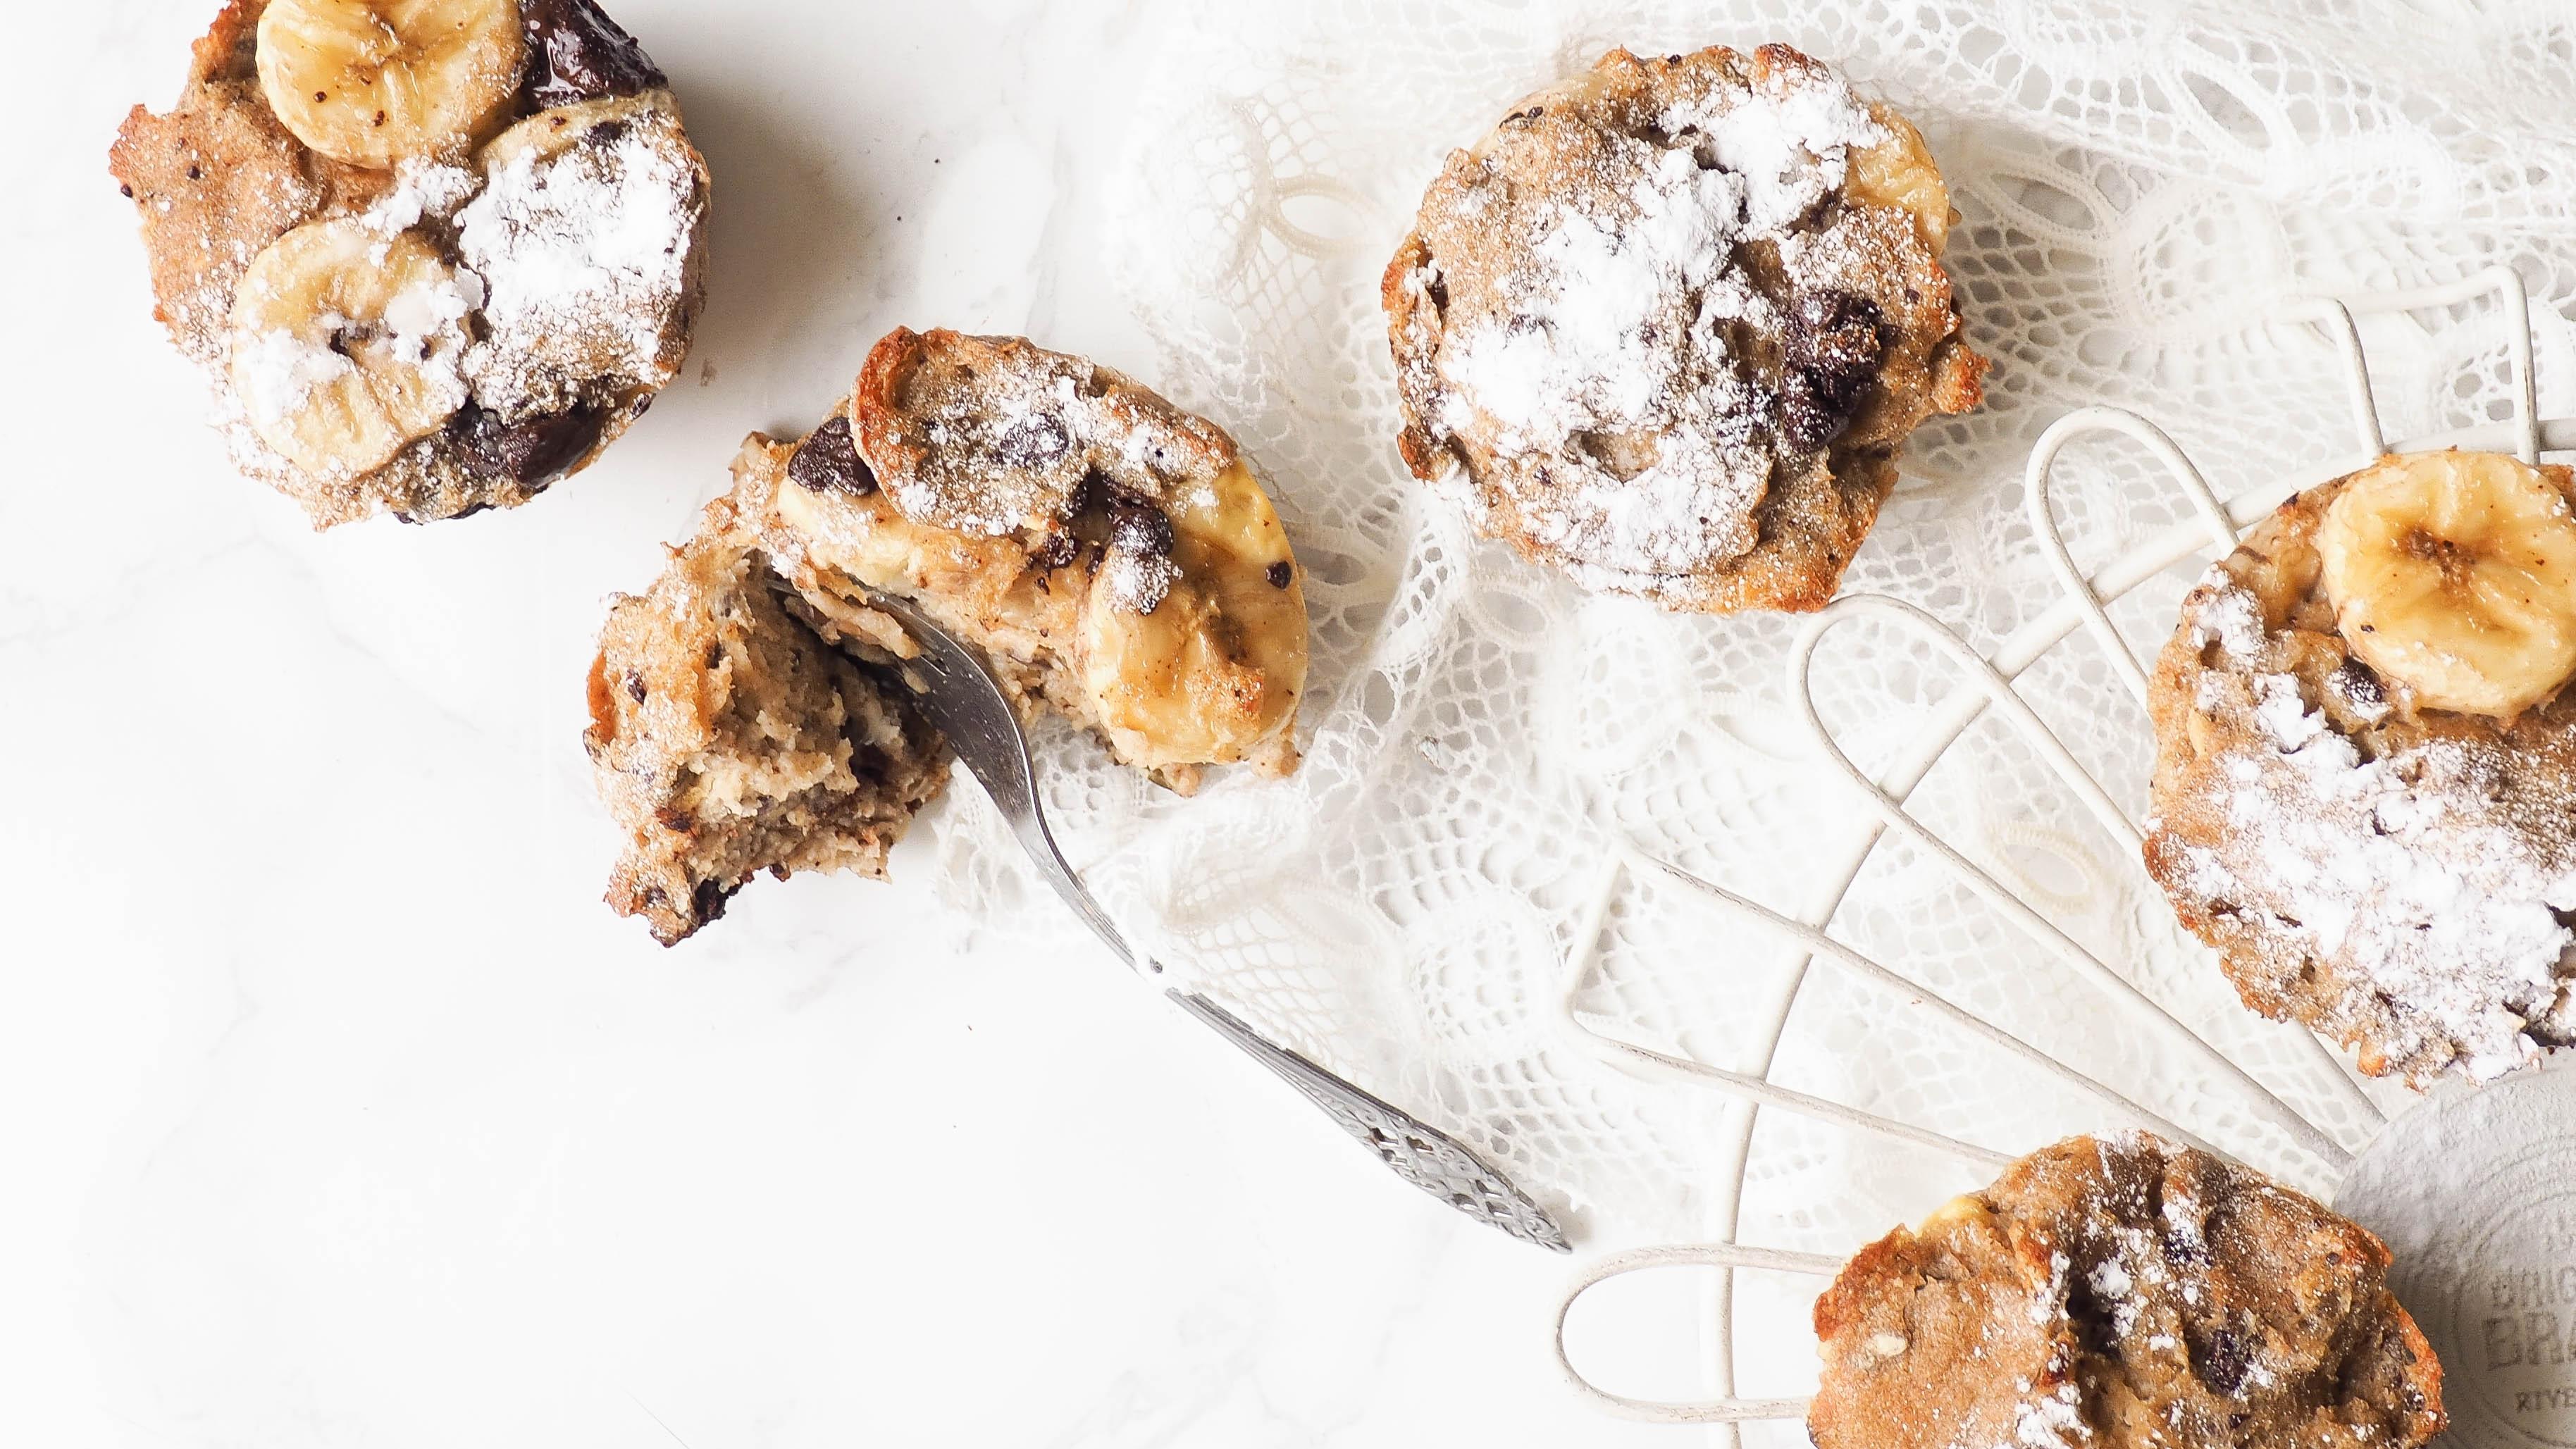 Recept: Chuncky monkey broodpudding muffins